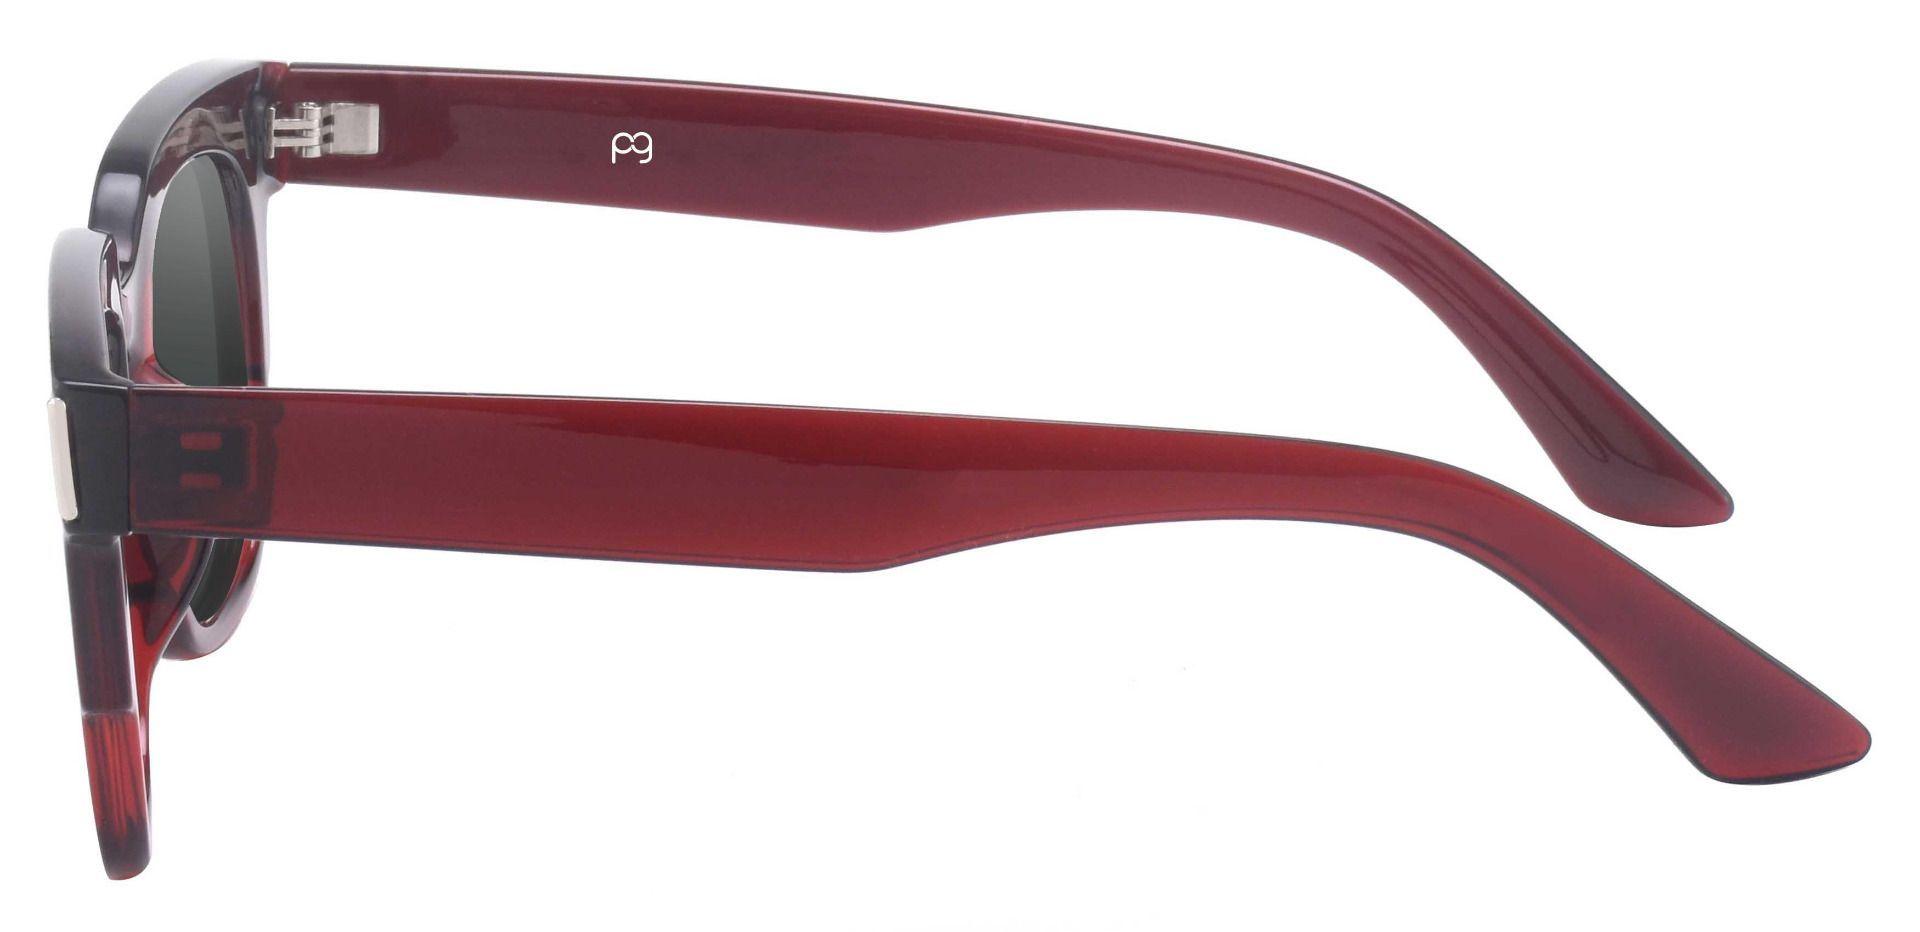 Ardent Square Progressive Sunglasses - Red Frame With Gray Lenses